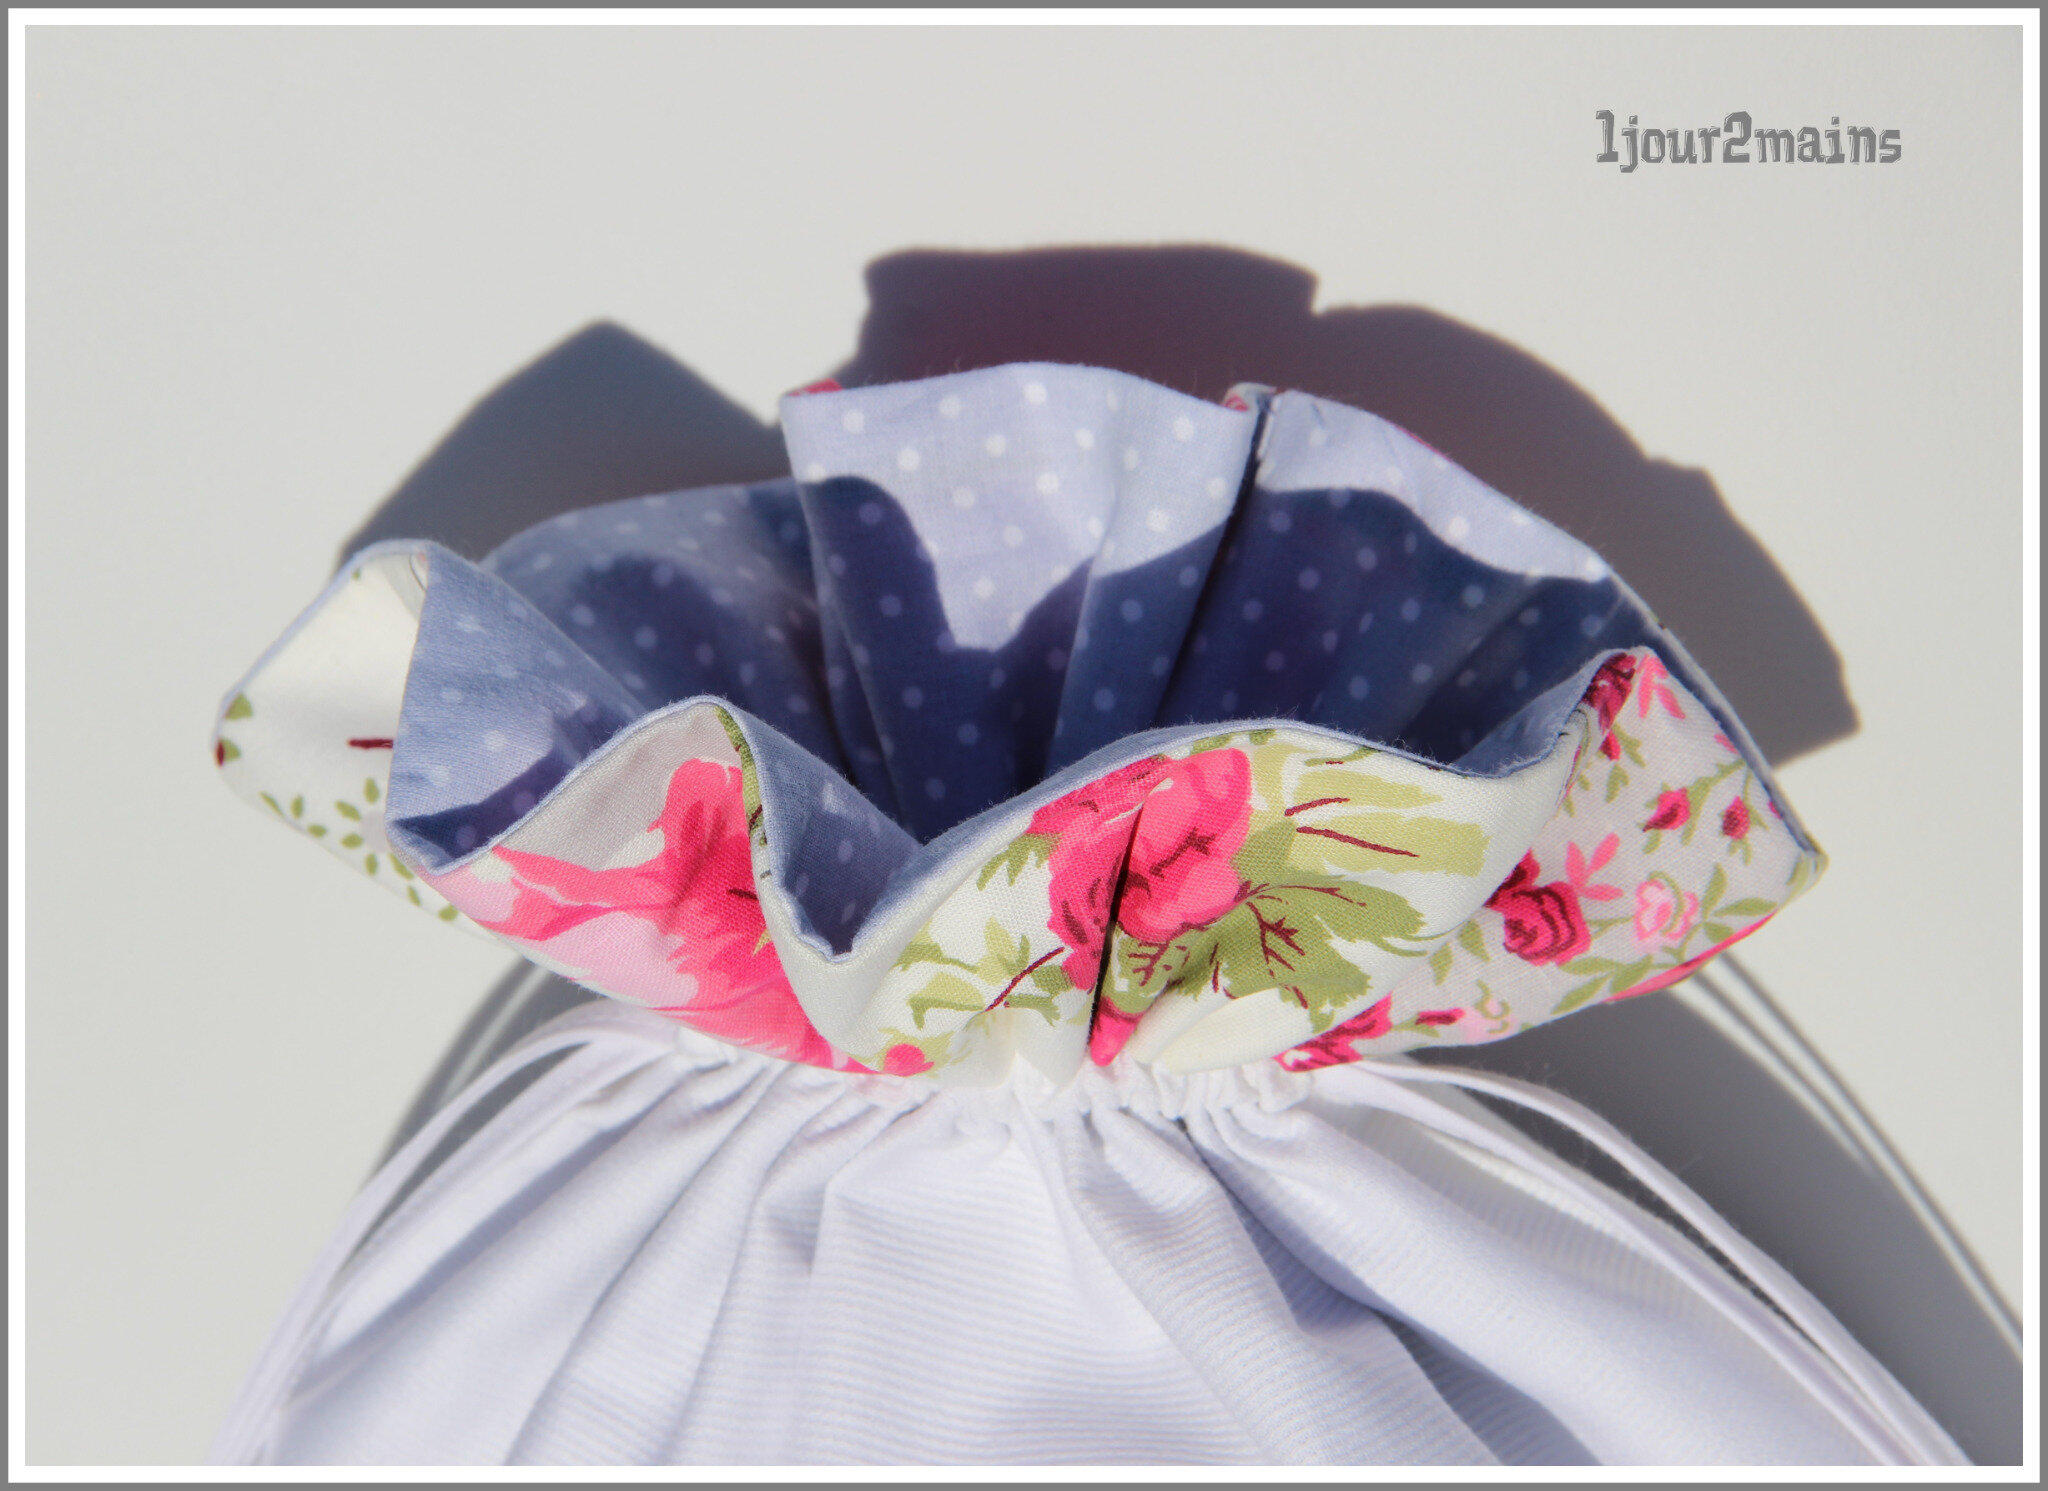 sac lingerie renelise haut